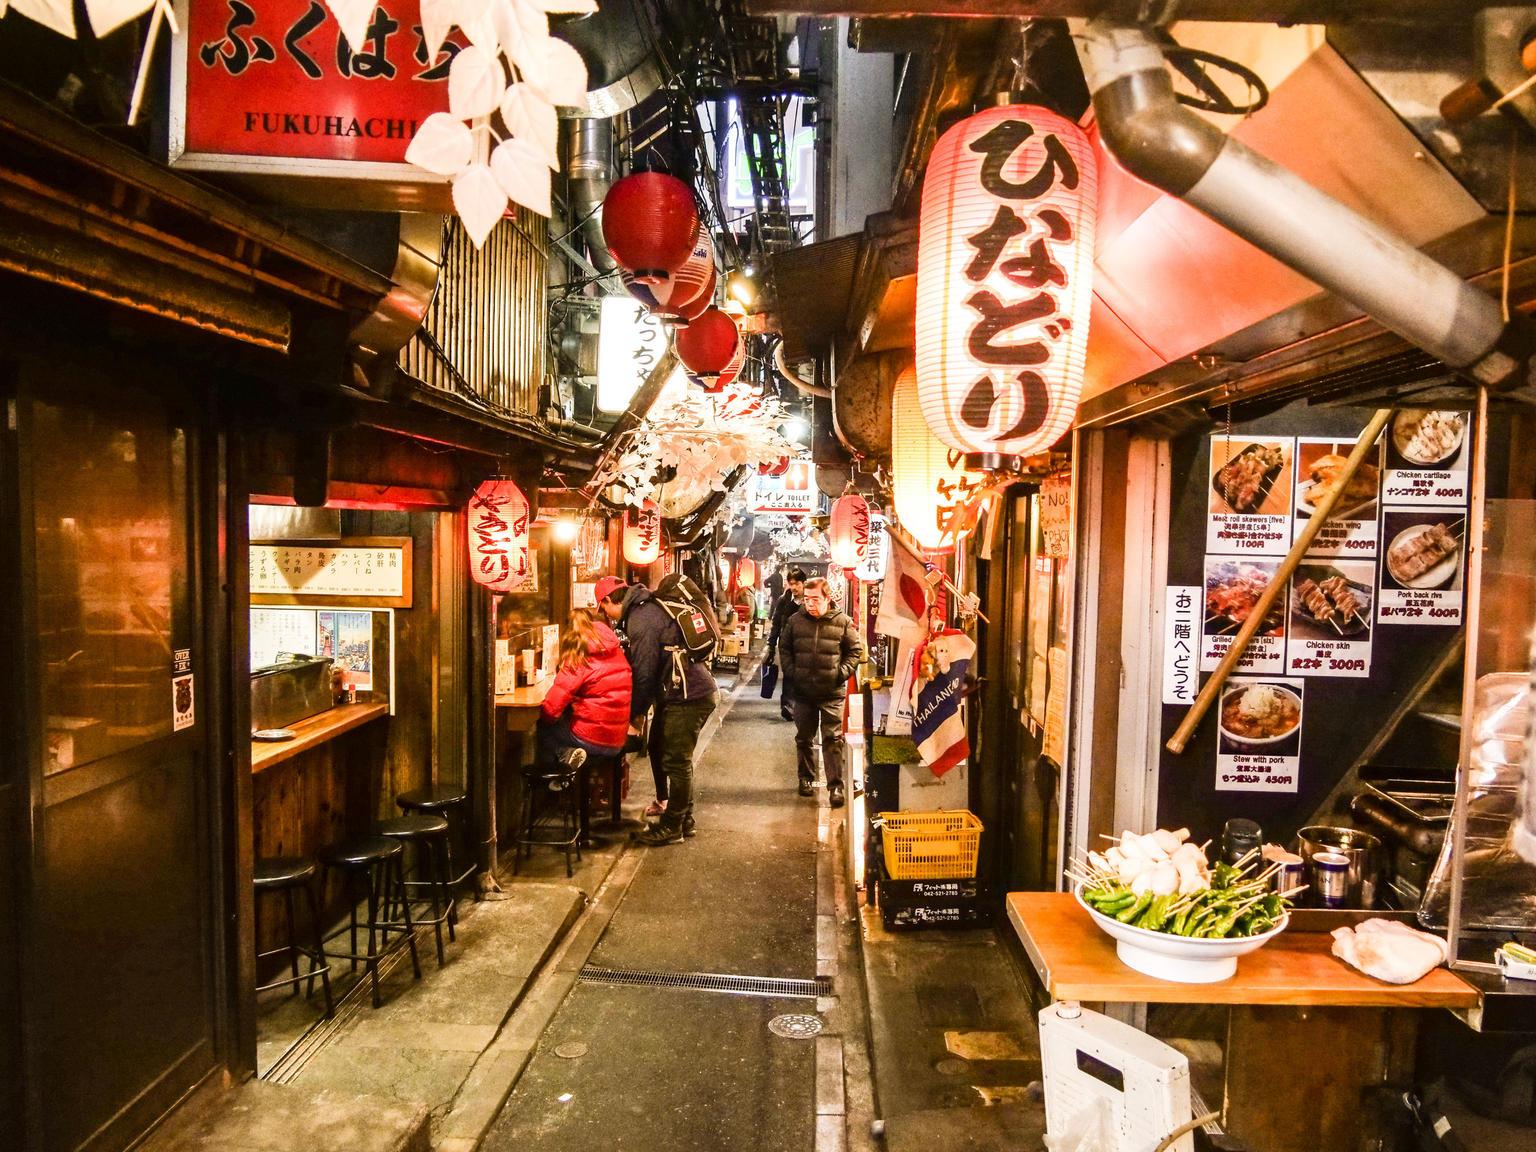 Tokio, Kobe & Okinawa mit Sushi-Kurs, Tokio Streetfood und Sake-Verkostung entdecken